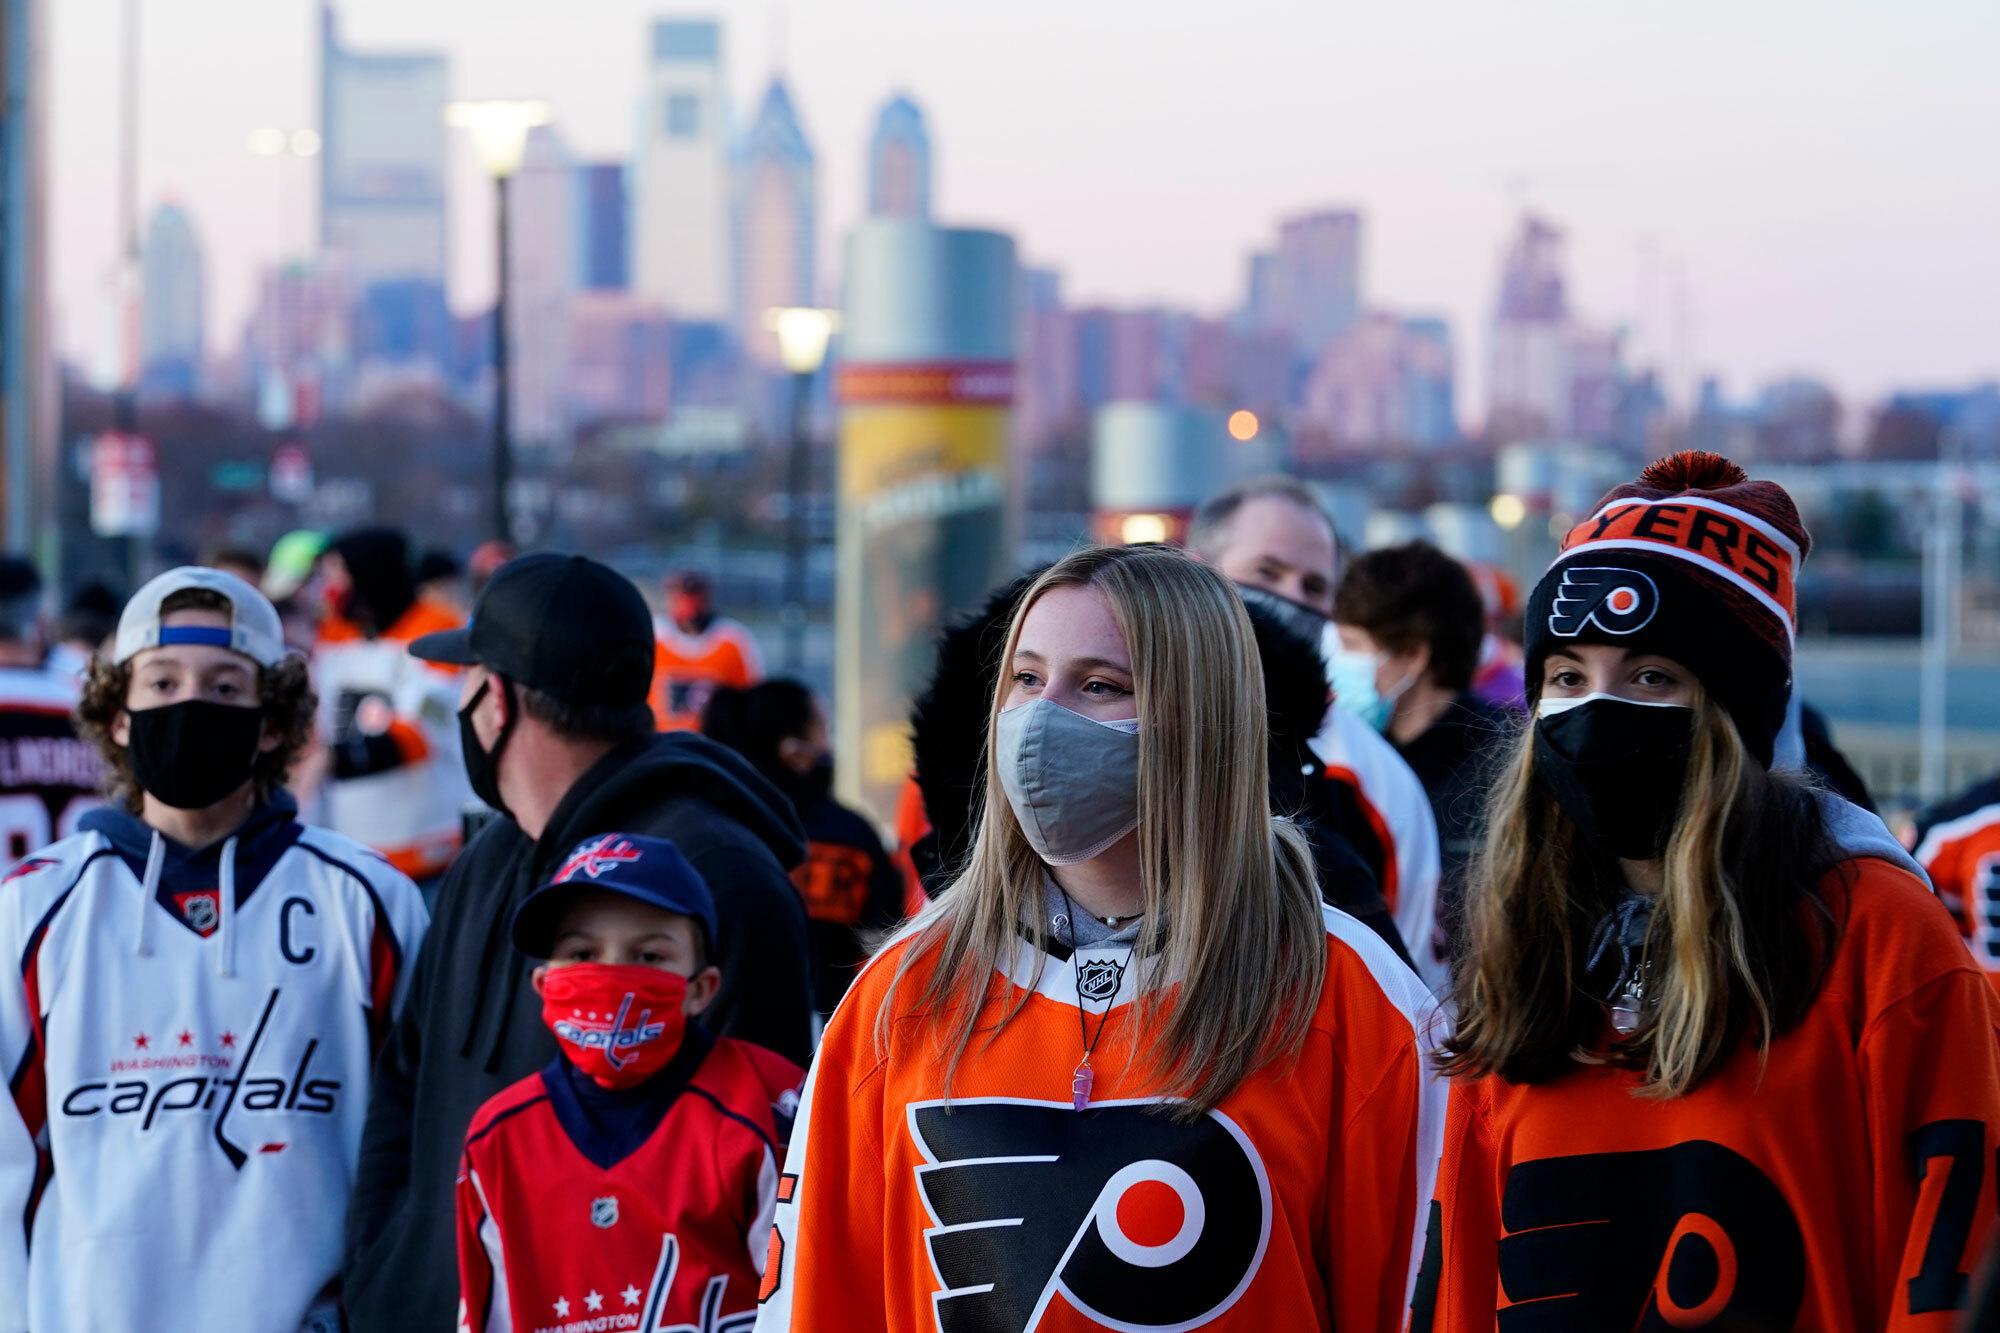 Fans wearing face masks line up outside the Wells Fargo Center